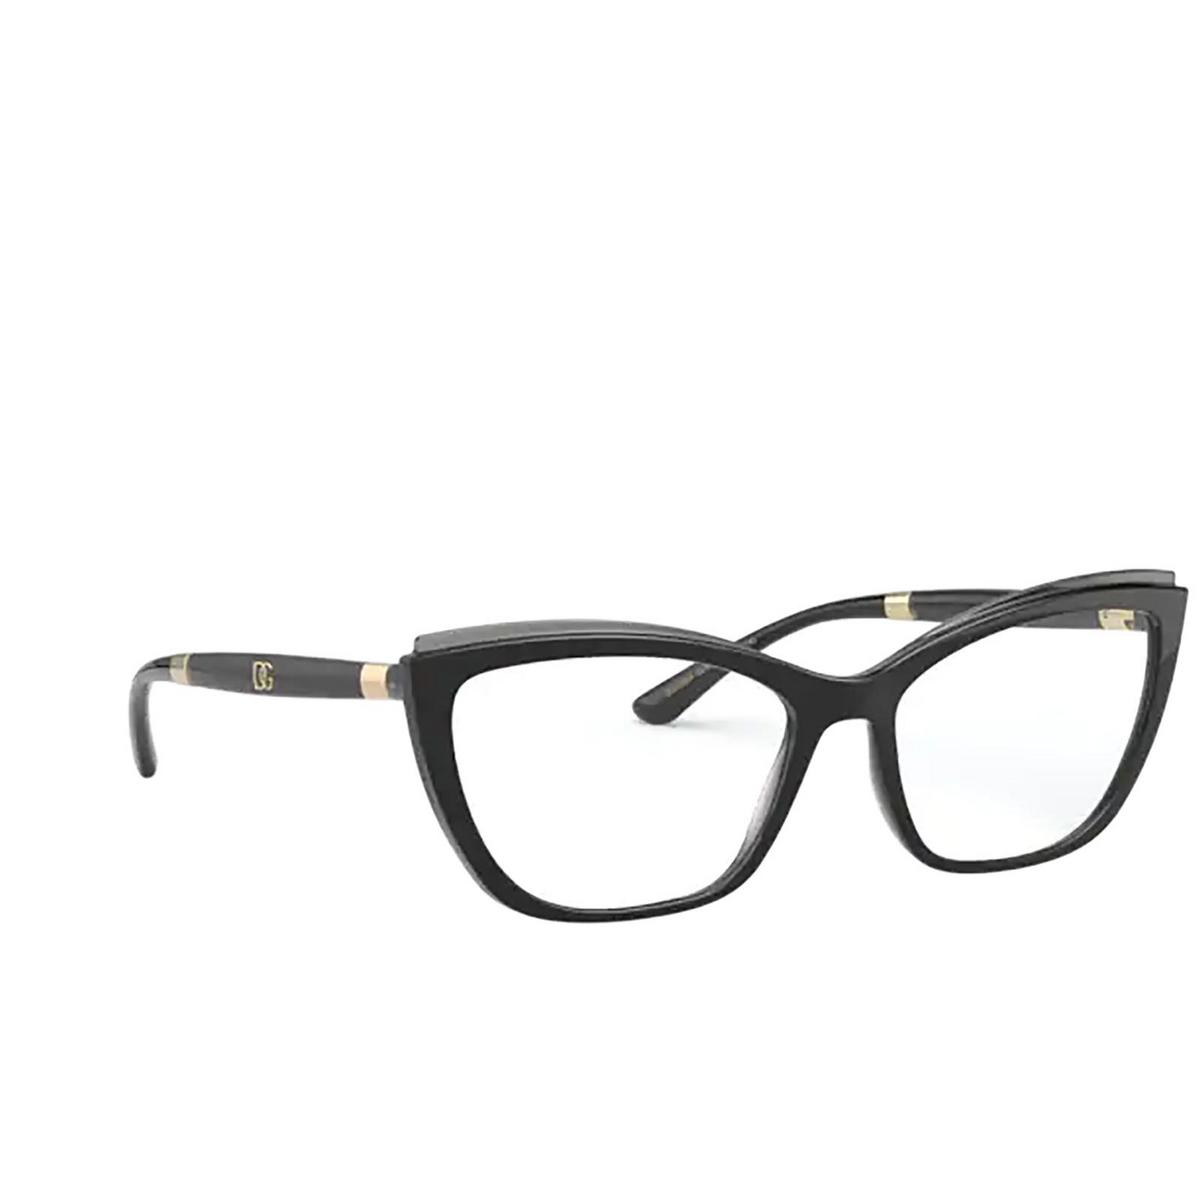 Dolce & Gabbana® Cat-eye Eyeglasses: DG5054 color Black On Transparent Grey 3246 - three-quarters view.